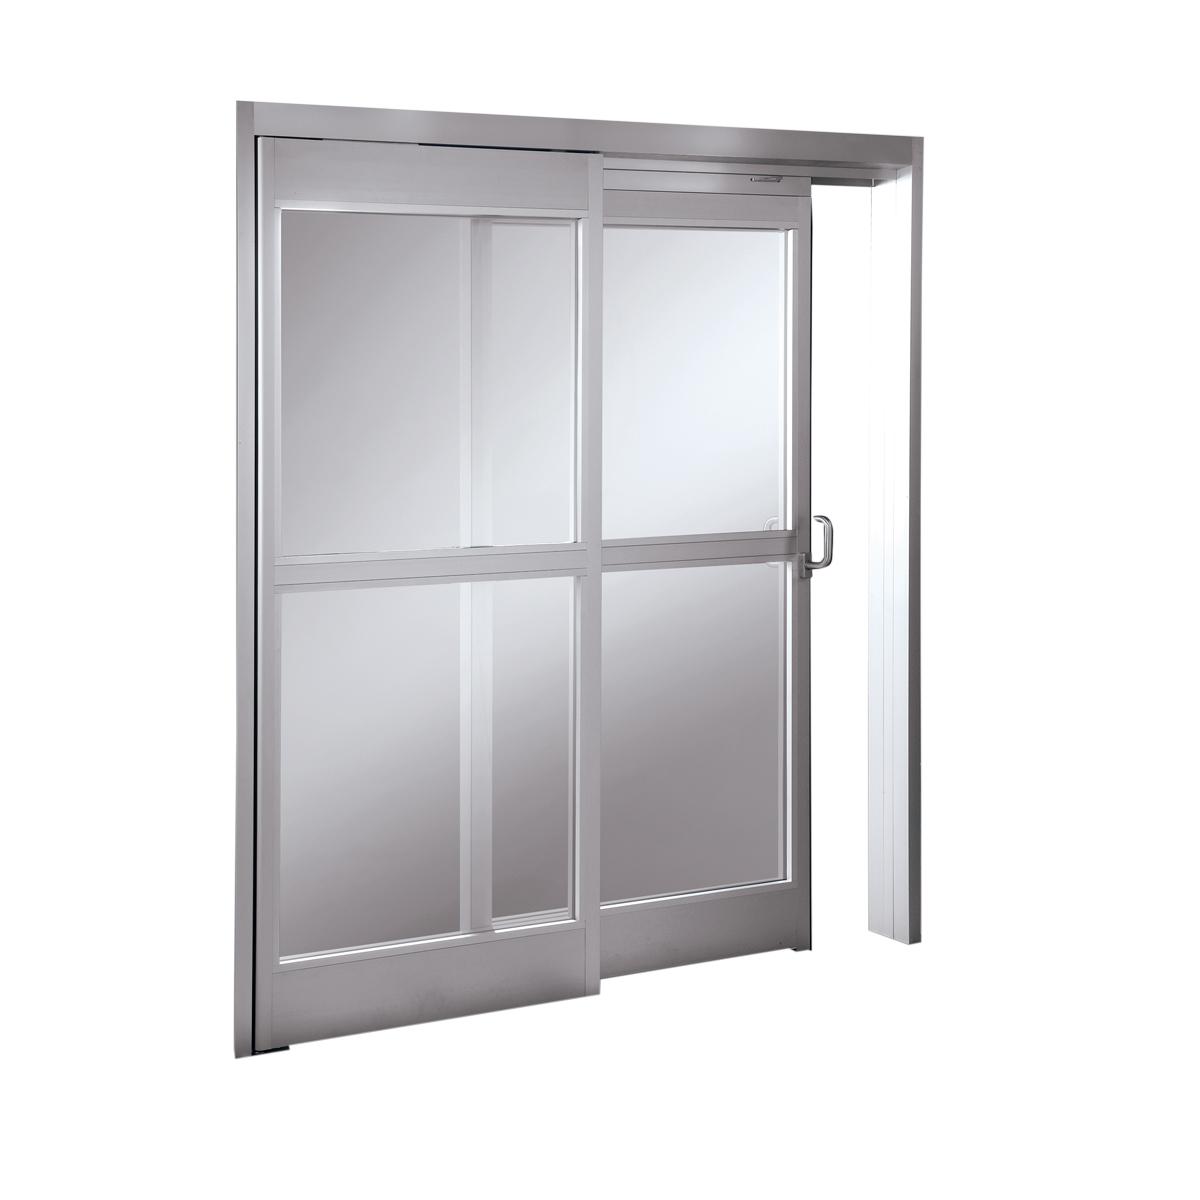 Icu Manual Sliding Doors